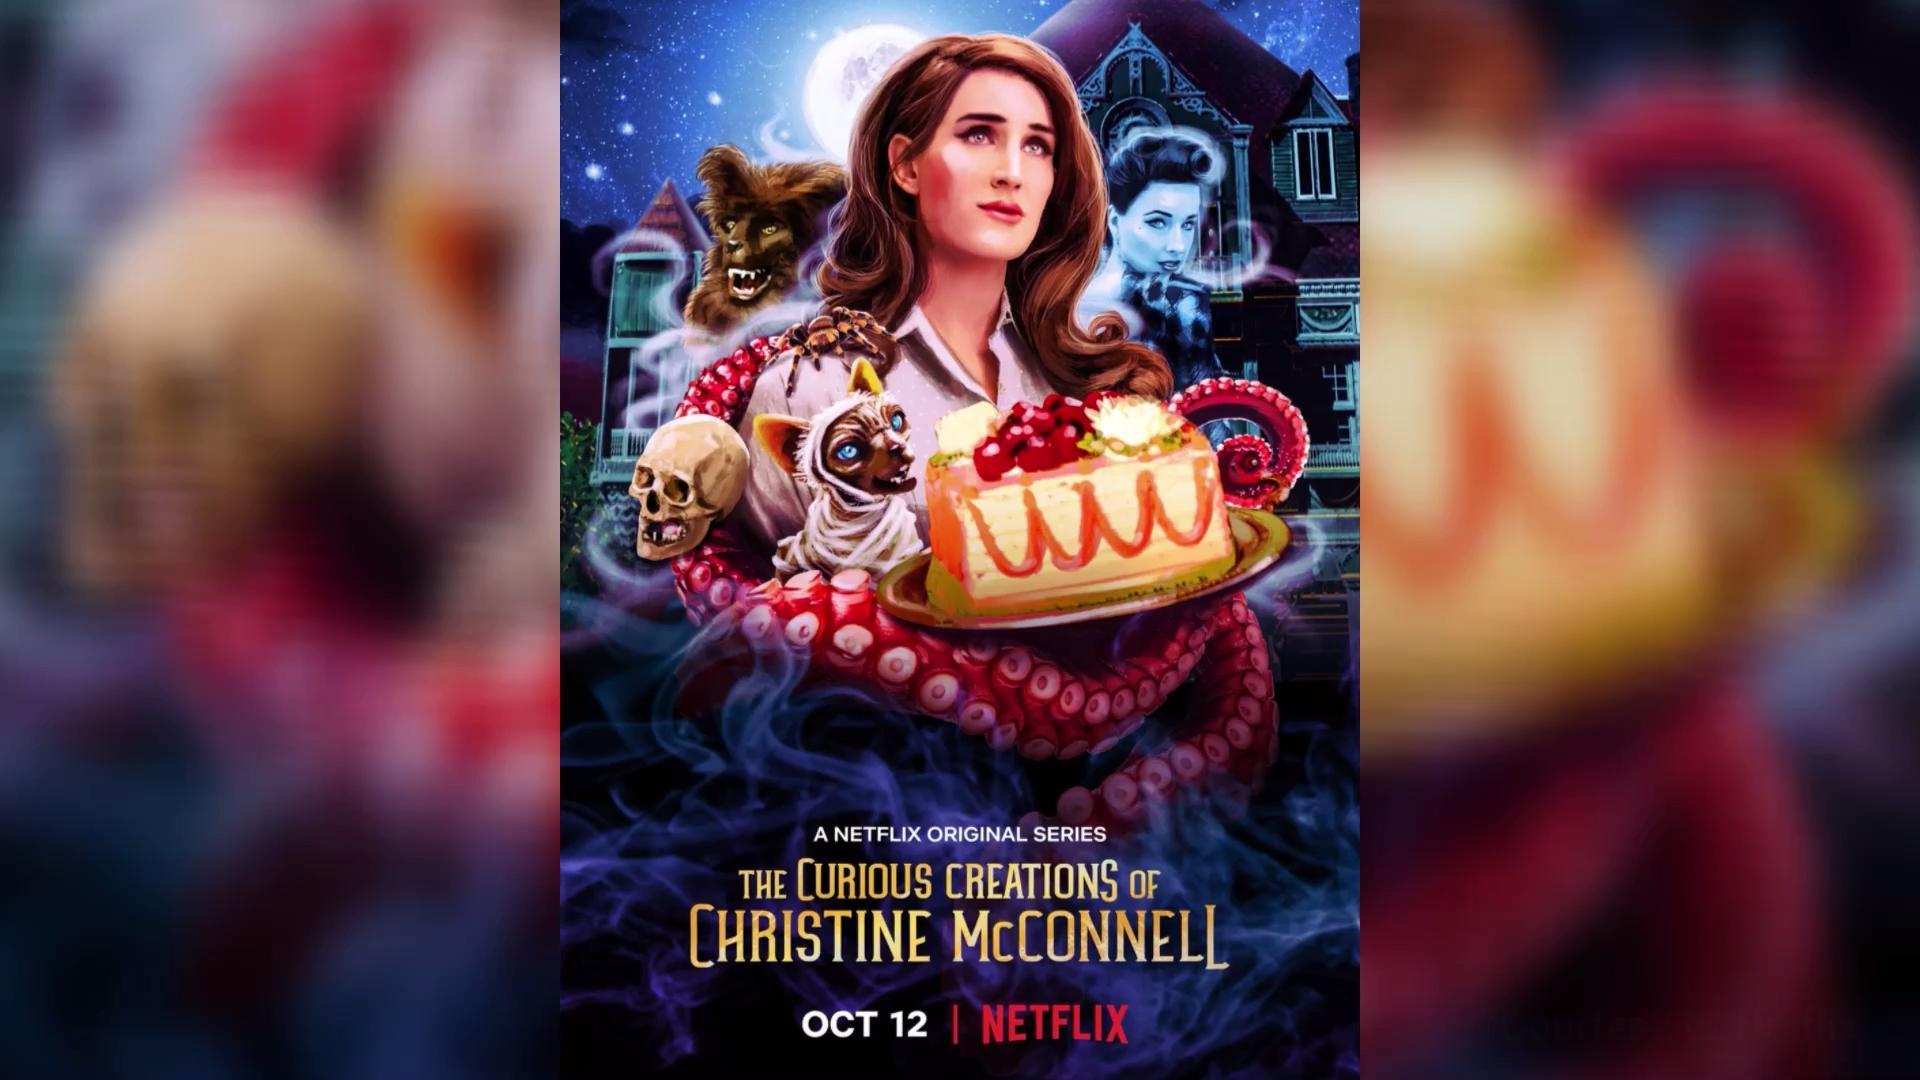 A Bizarra Confeitaria de Christine McConnell chega à Netflix neste HalloweenA Bizarra Confeitaria de Christine McConnell chega à Netflix neste Halloween